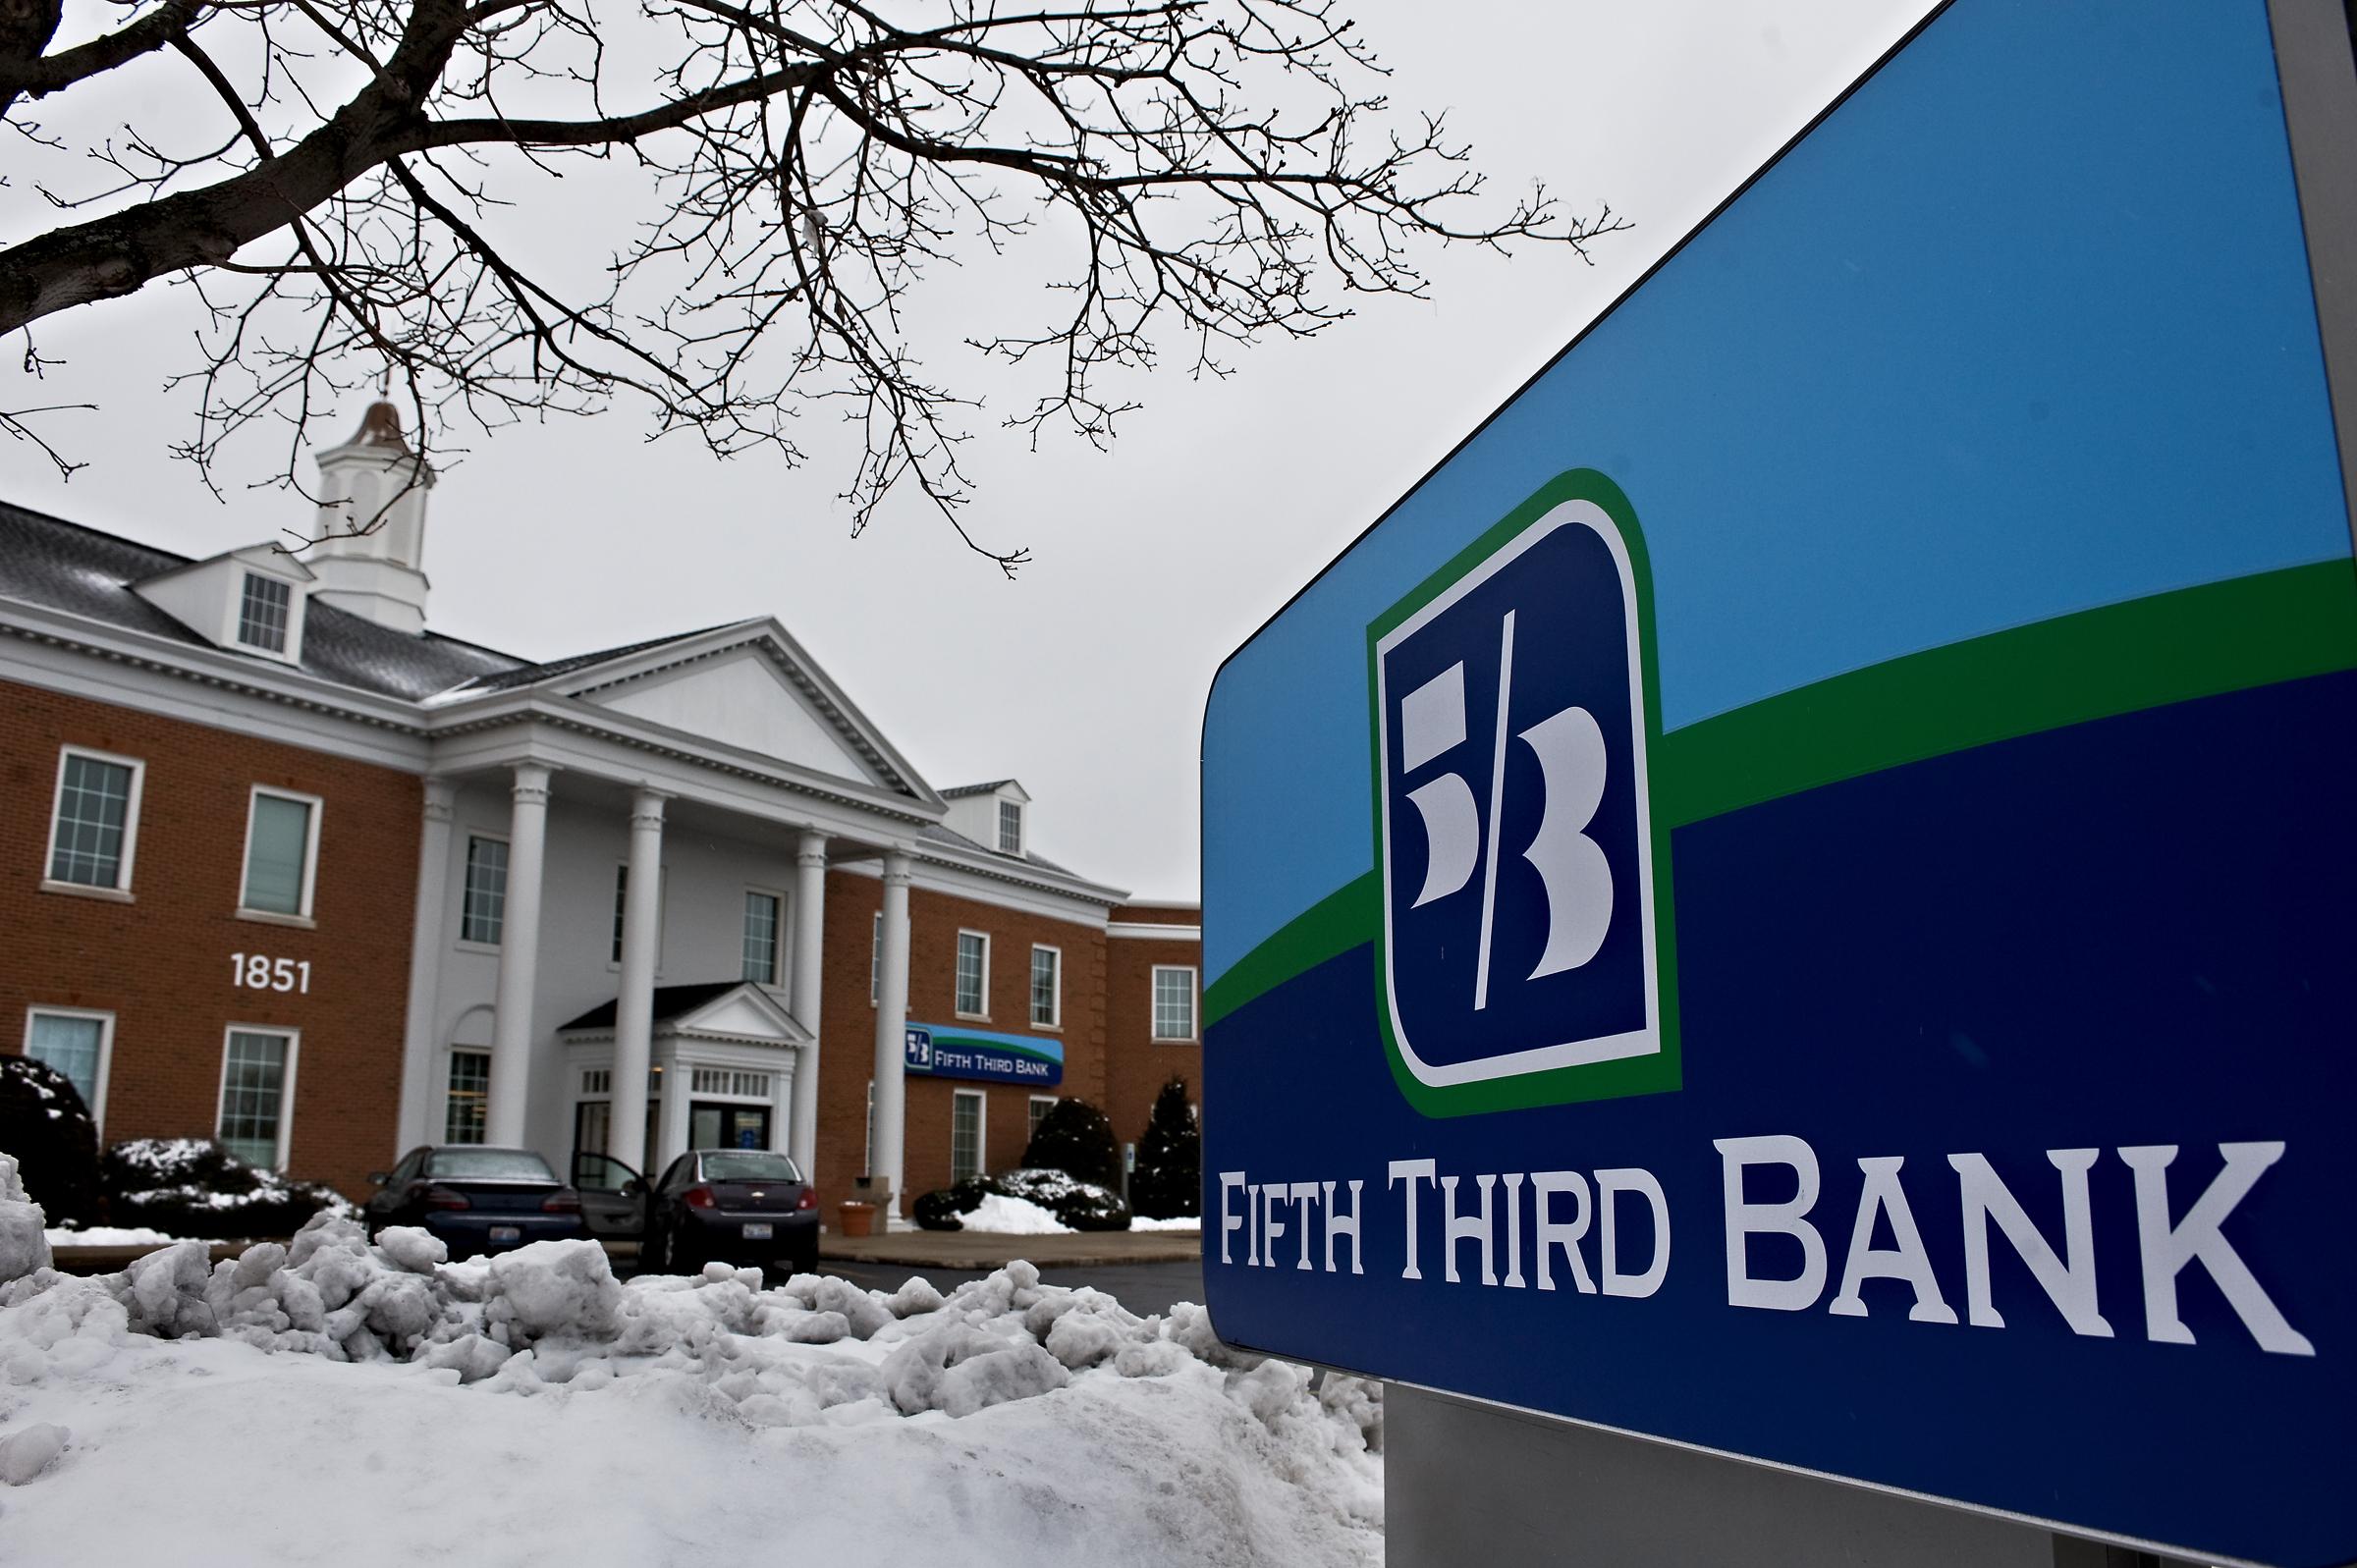 A Fifth Third Bank sign